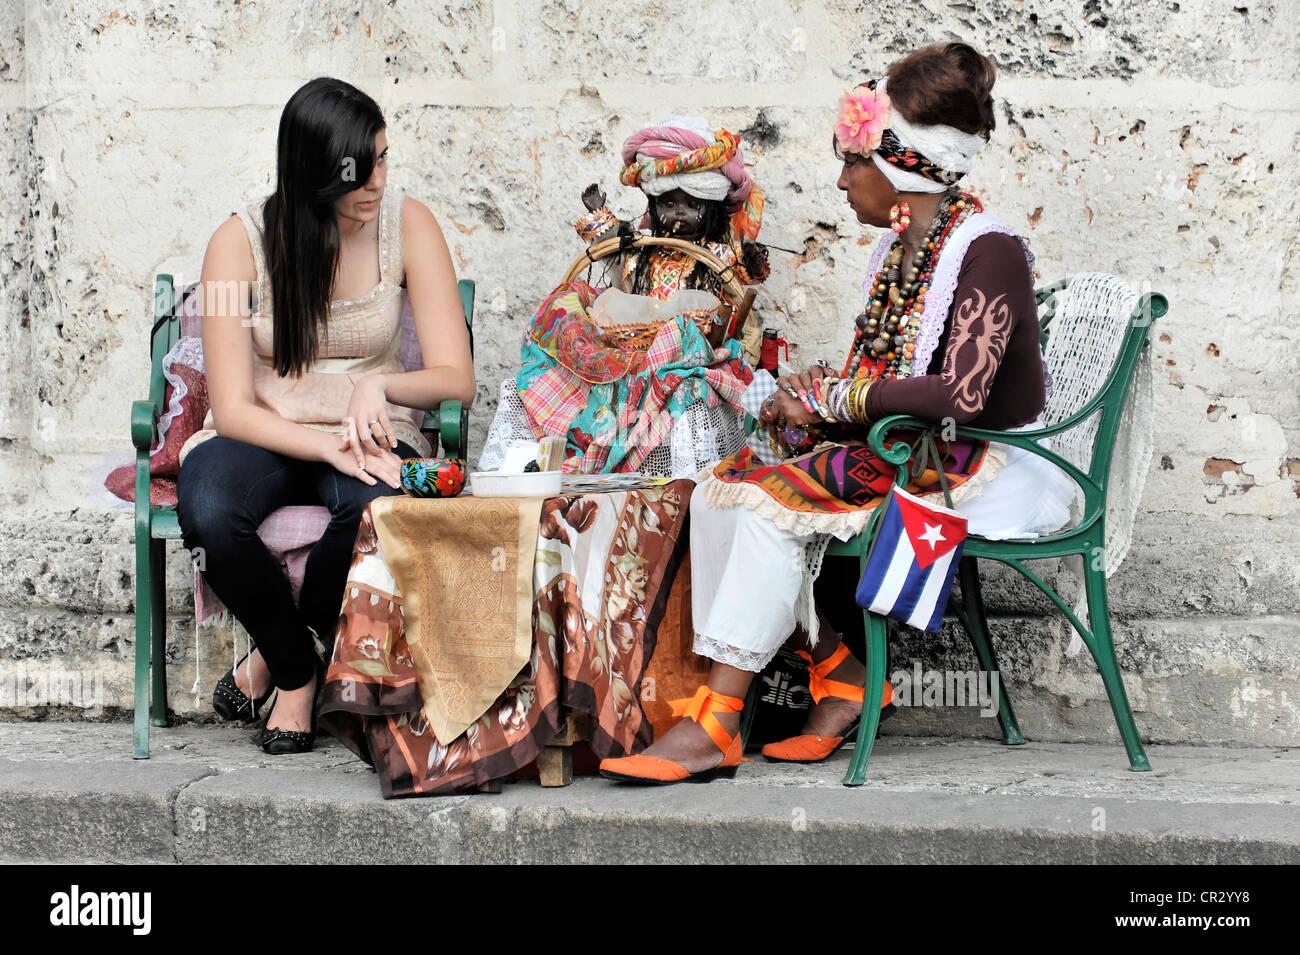 Fortune teller with a tourist, Plaza de la Catedral, Havana, Cuba, Greater Antilles, Caribbean, Central America, - Stock Image